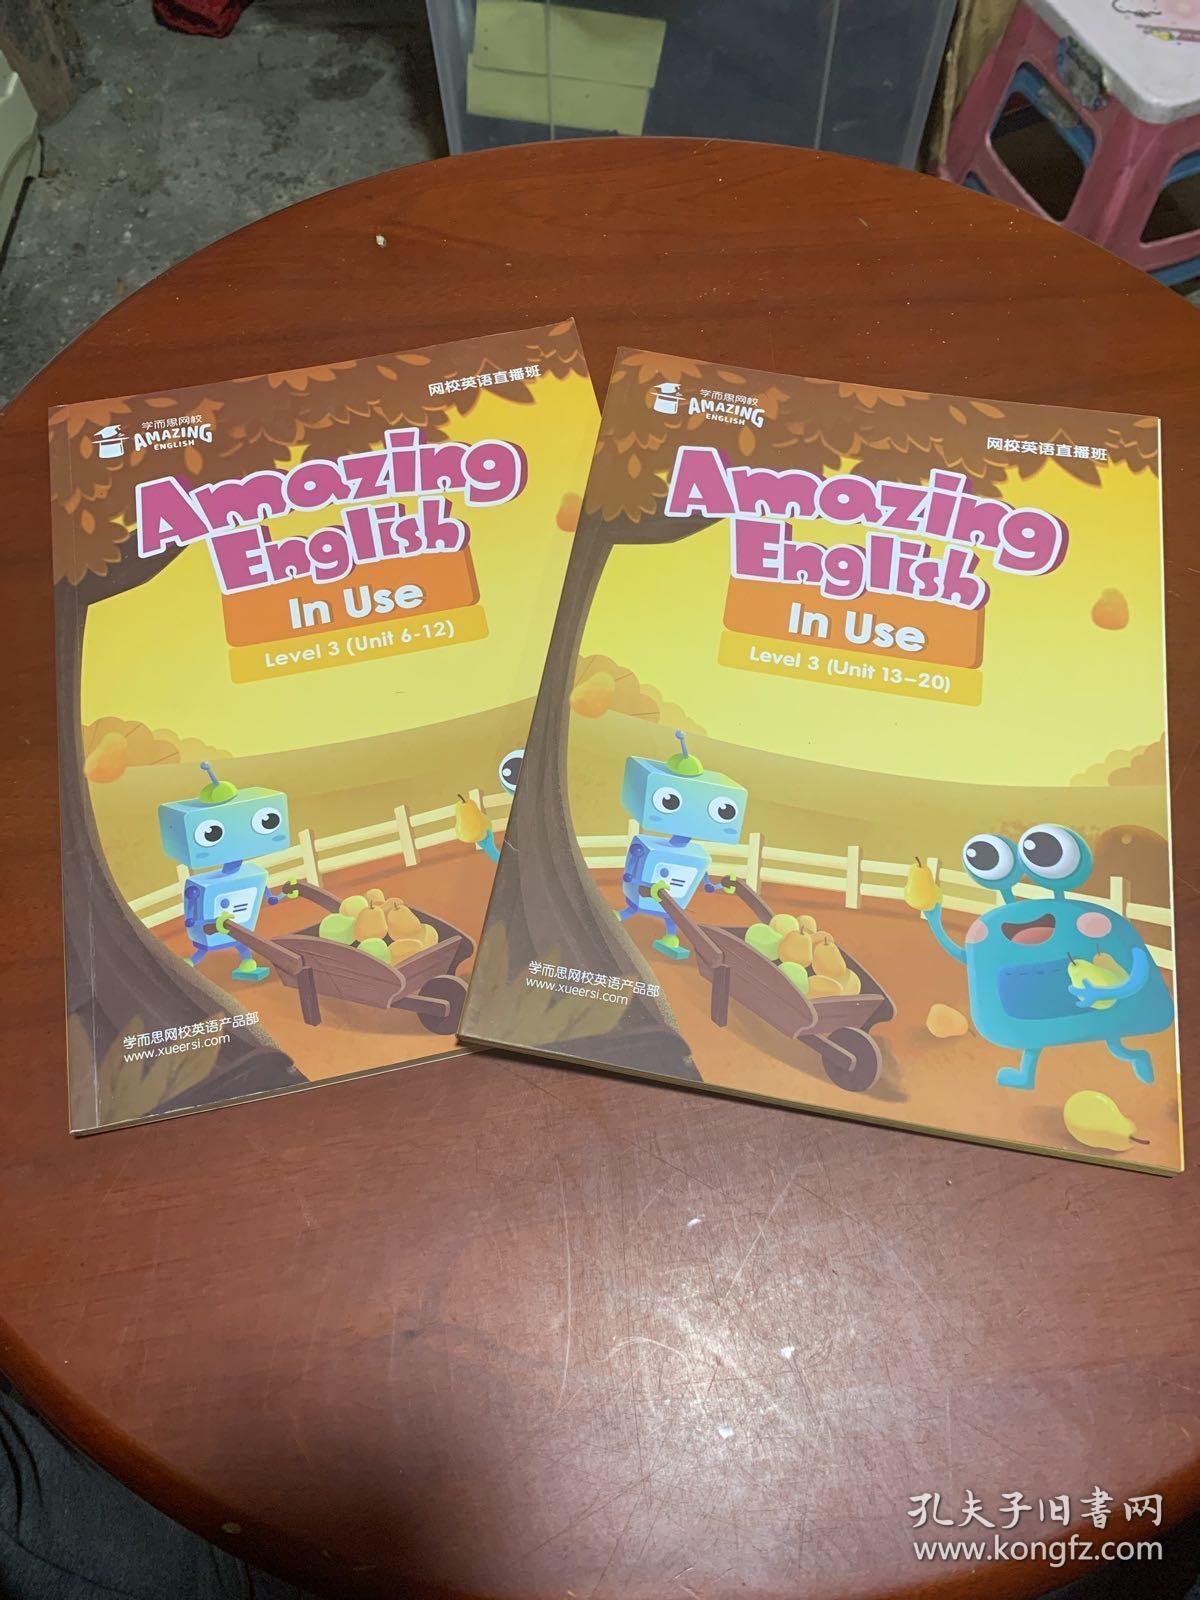 Amazing English In Use Level 2 (Unit 6-12、13-20) 两本合售